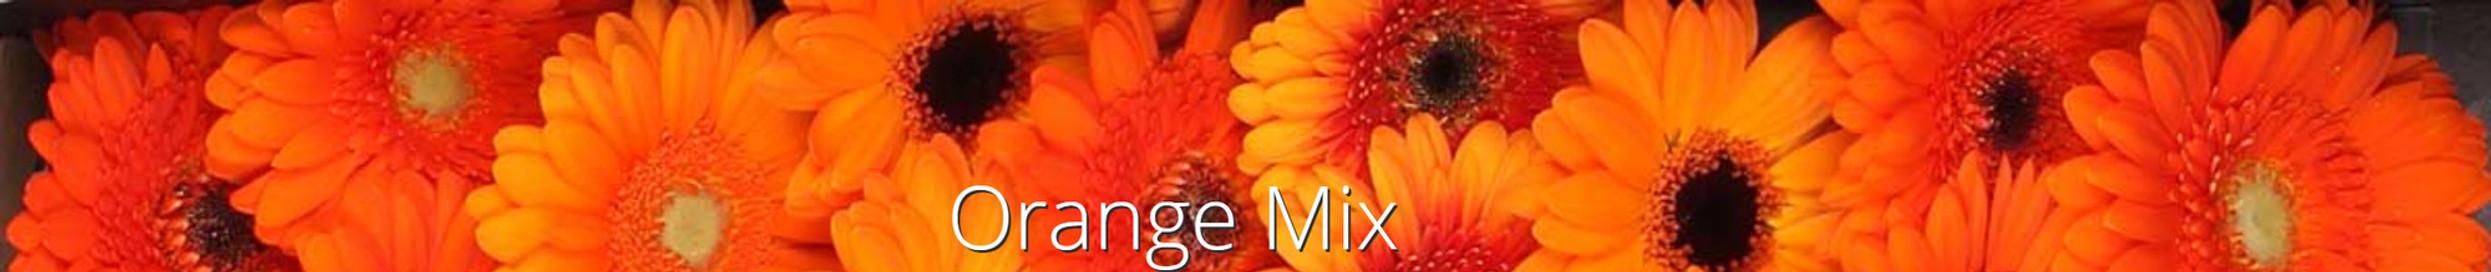 orange mix.jpg